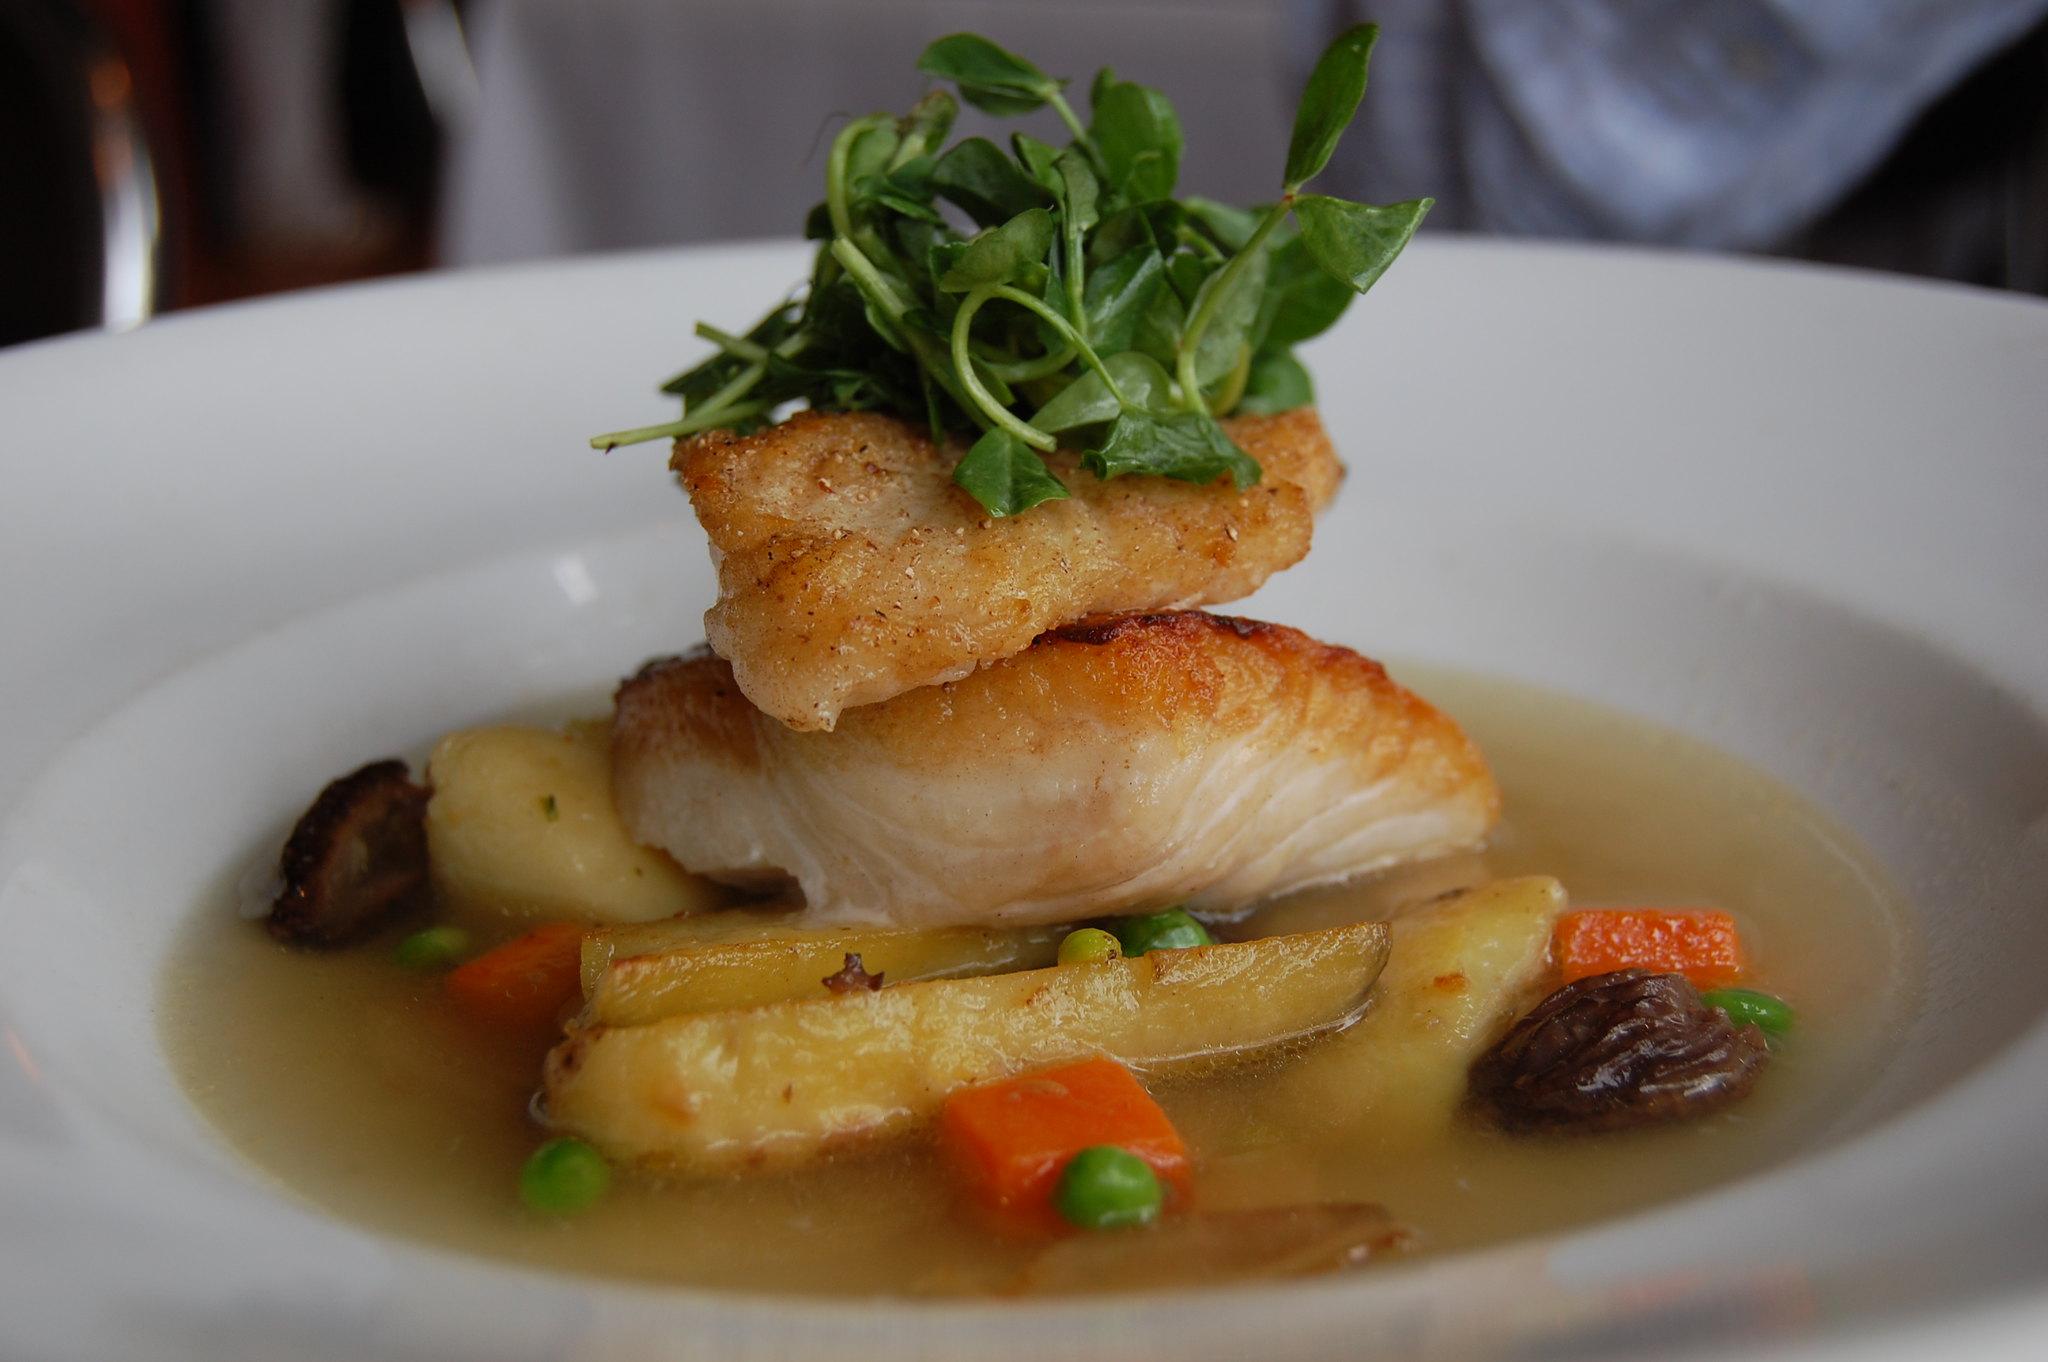 halibut with potatoes, broth, and garnish